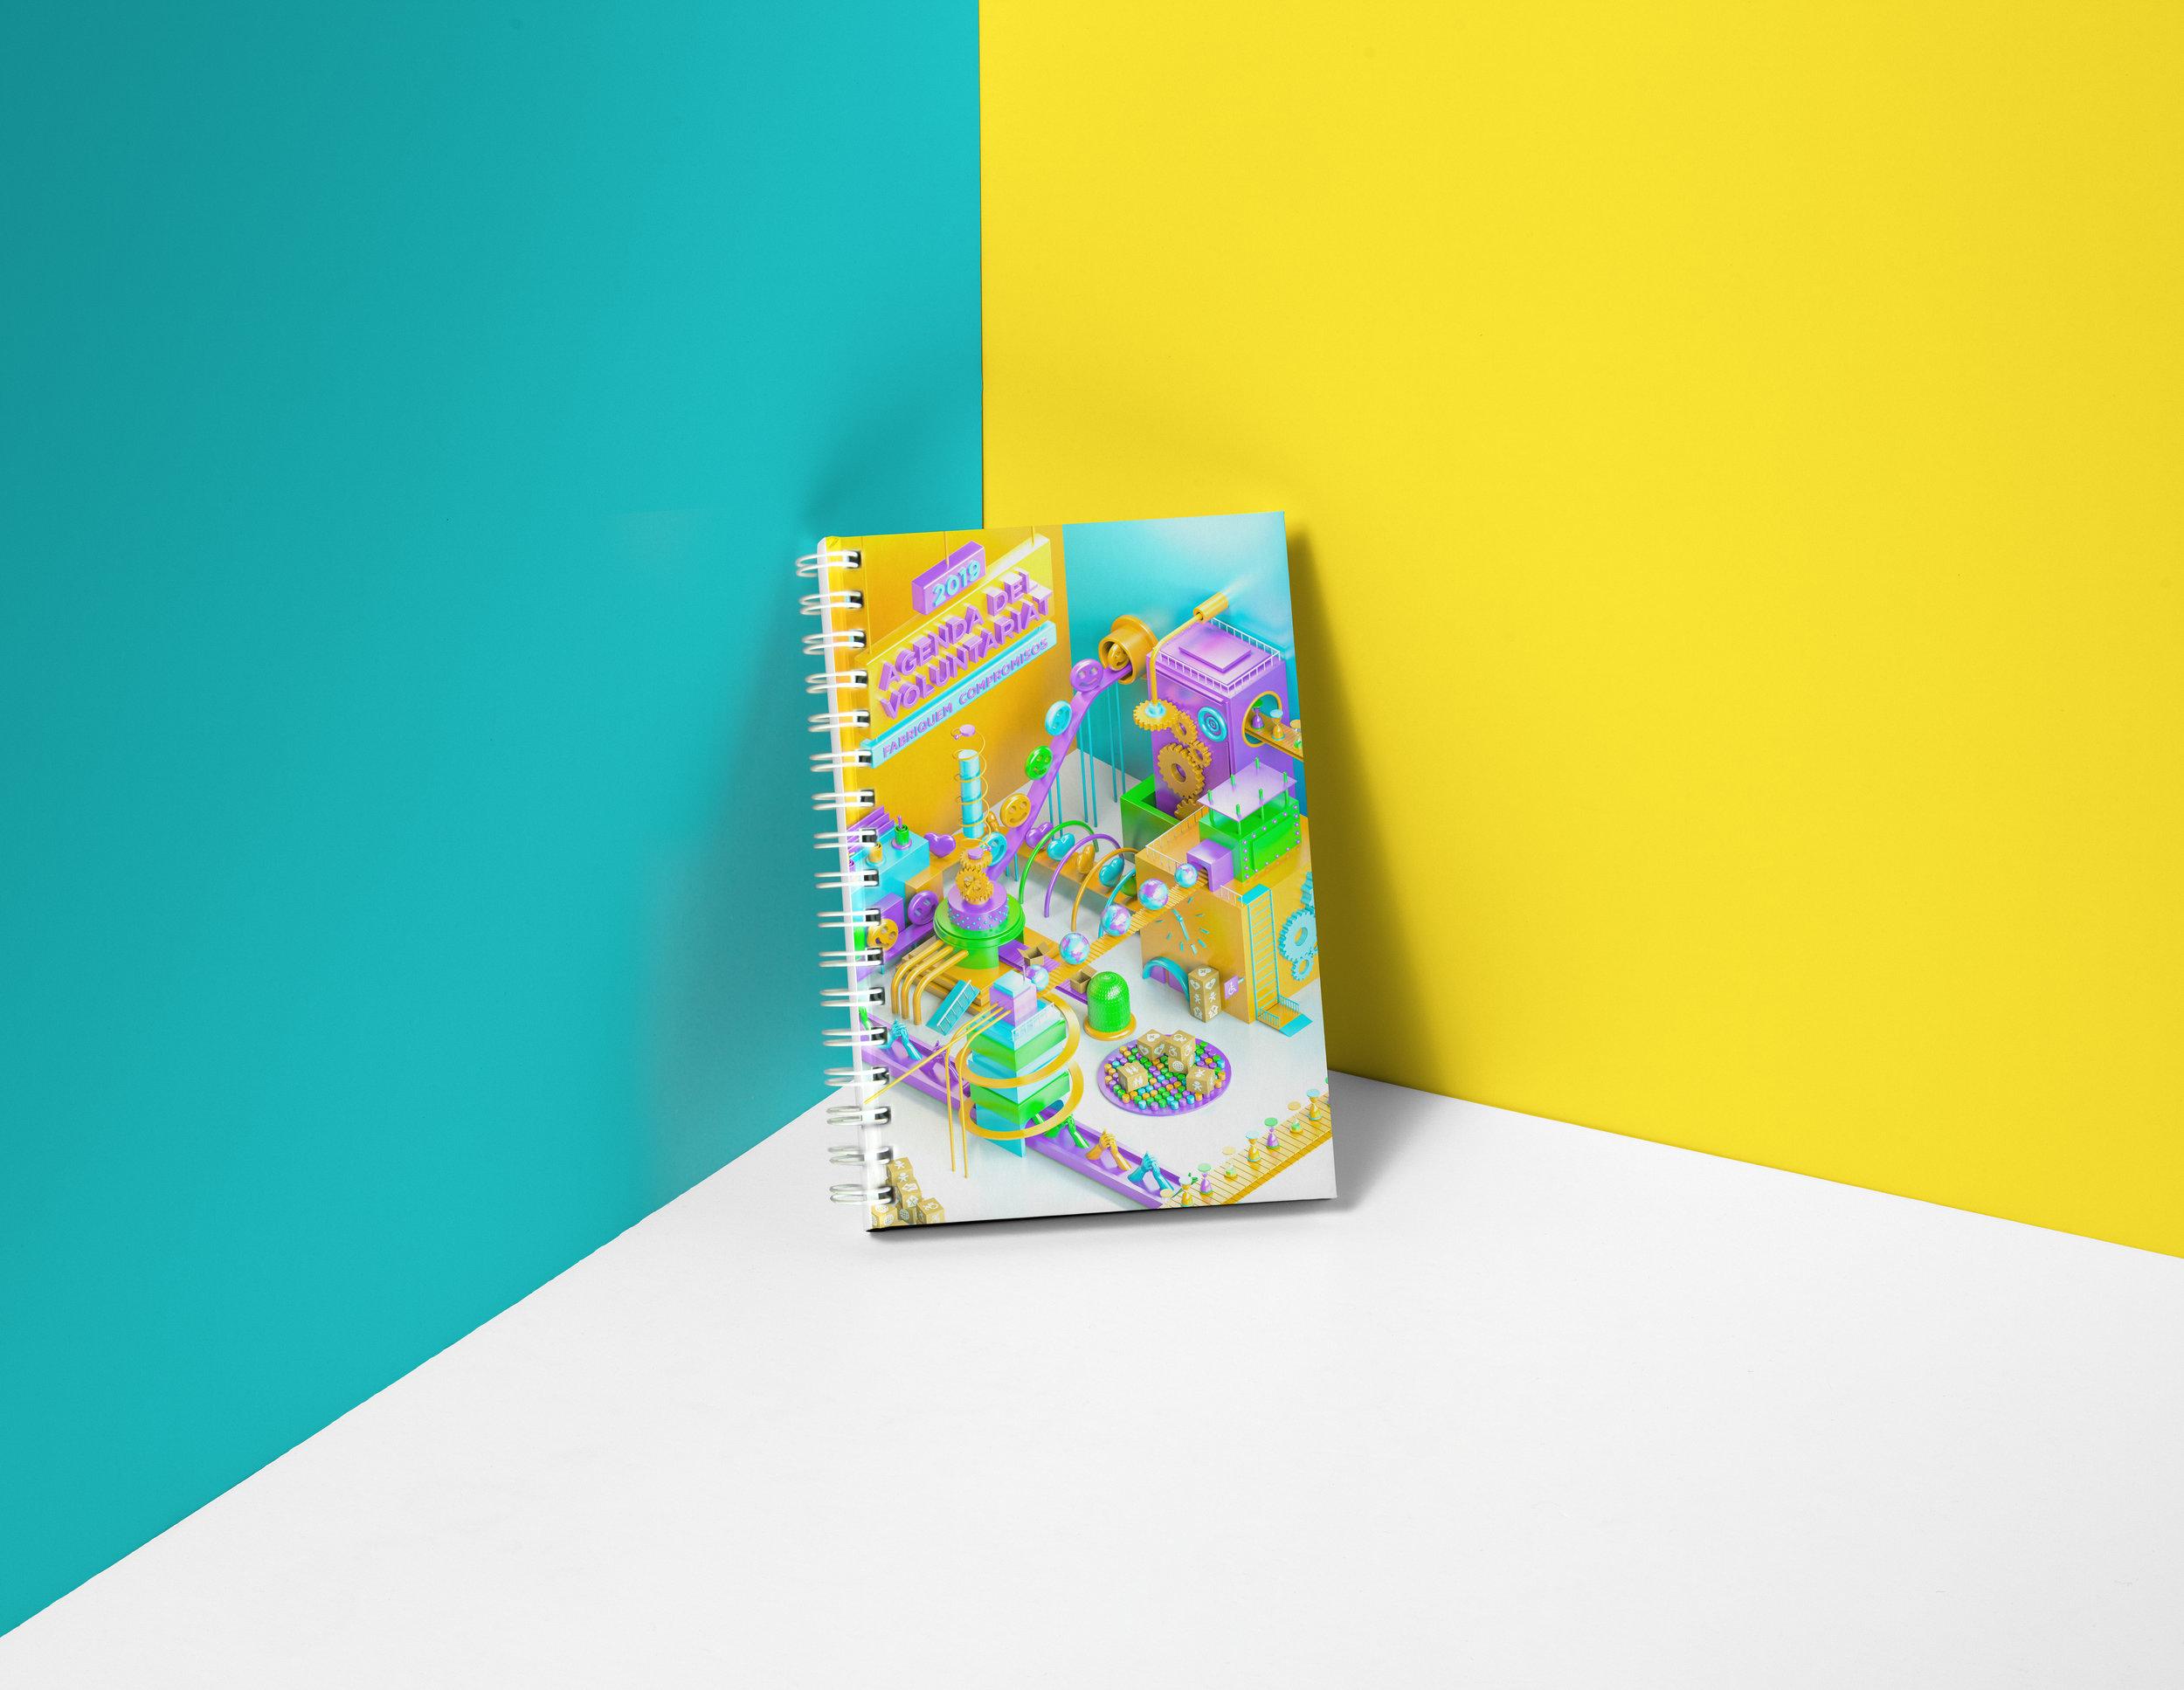 Hitabarity 3D - Freelance 3D Designer \u2014 2019 Volunteering Diary - 3D